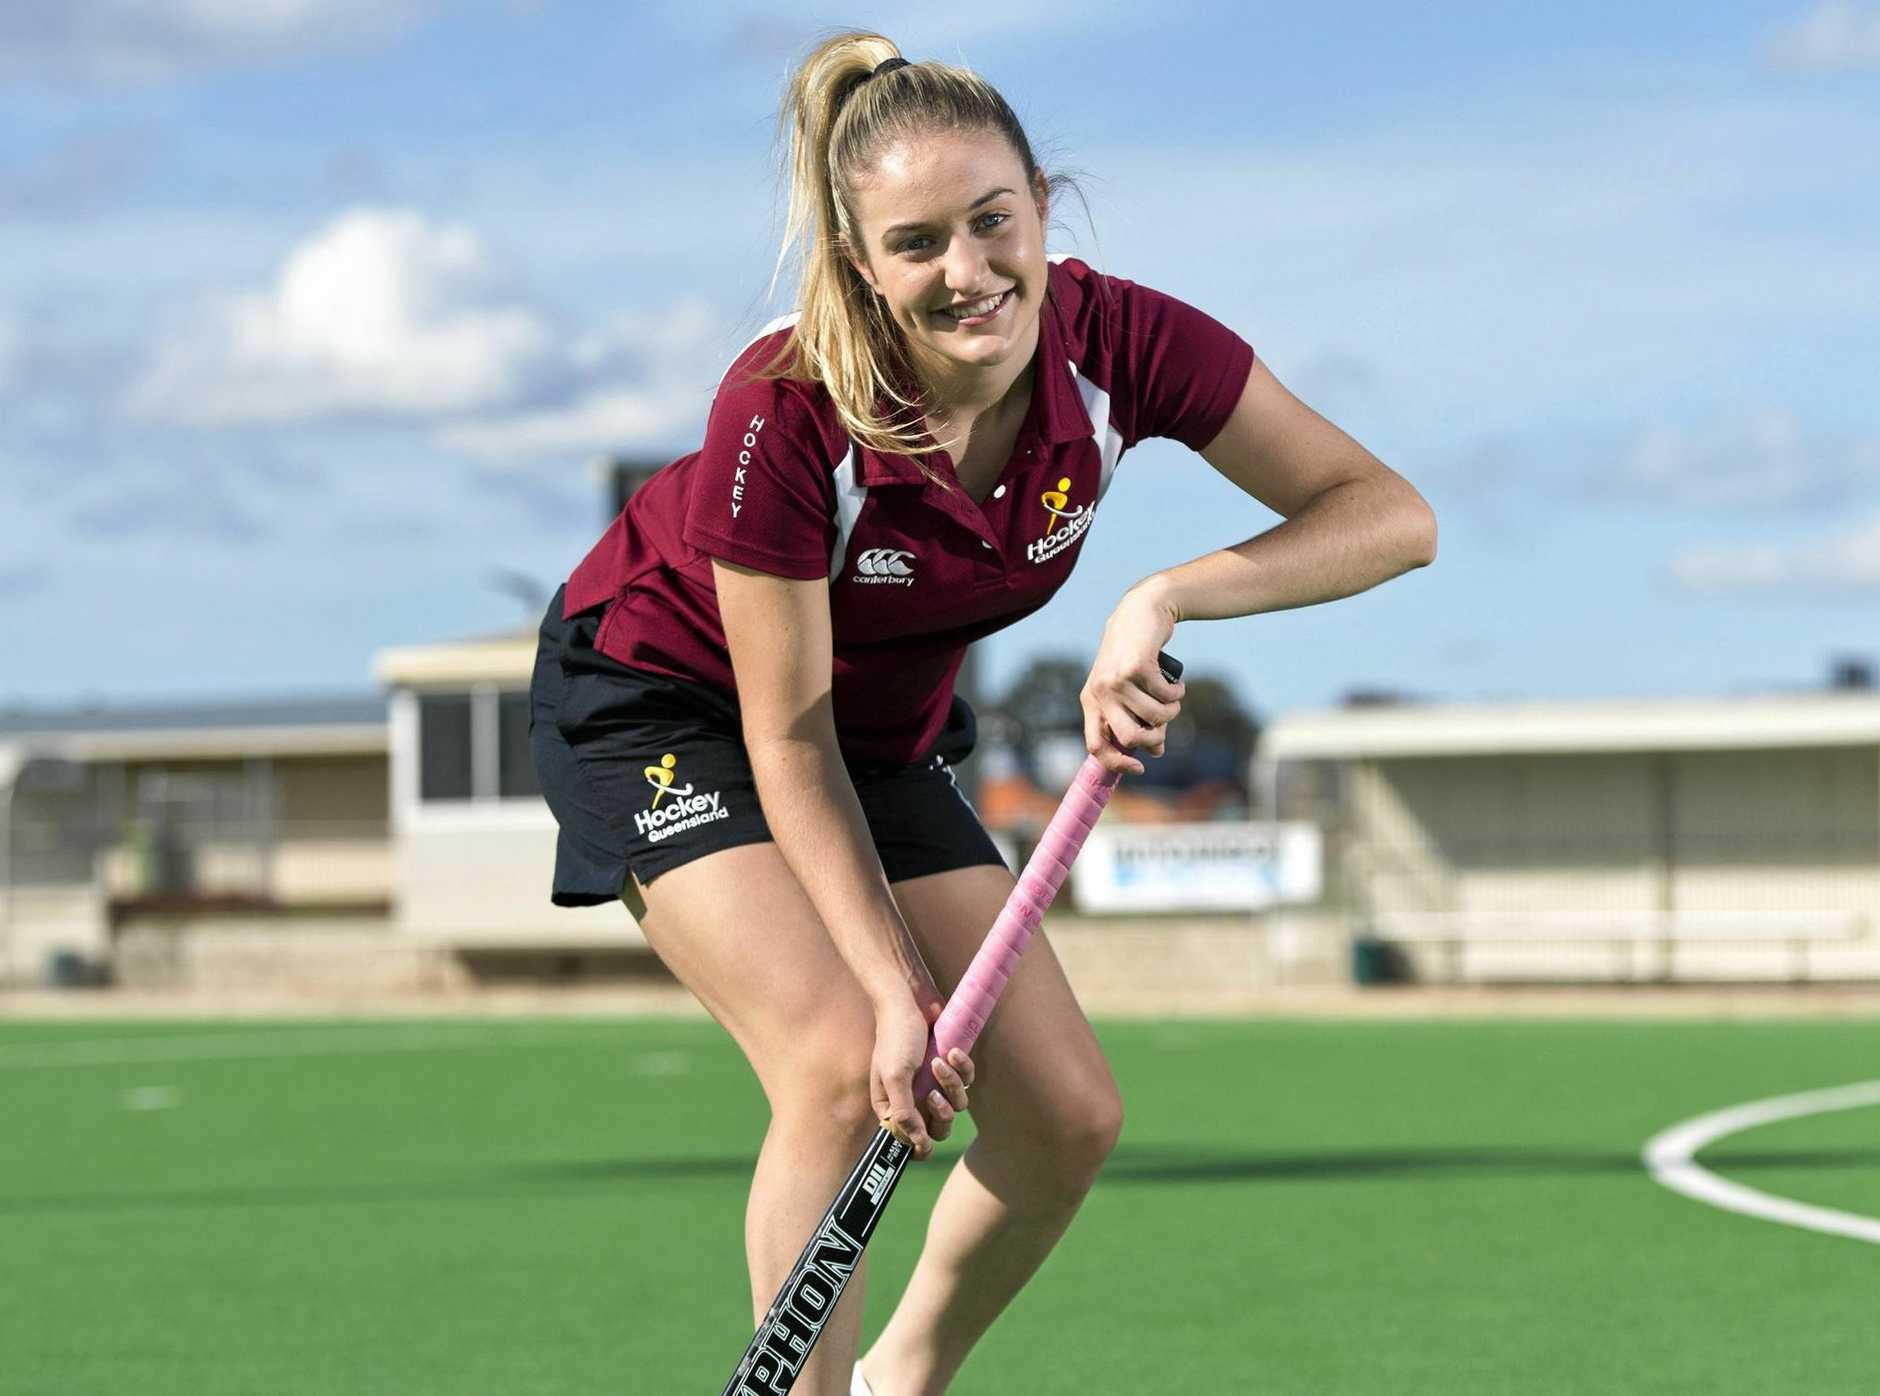 Hockey player Johannah Goschnick was part of the winning Queensland team at the U18 Australian Championships held in Tasmania, Monday, May 1, 2017.